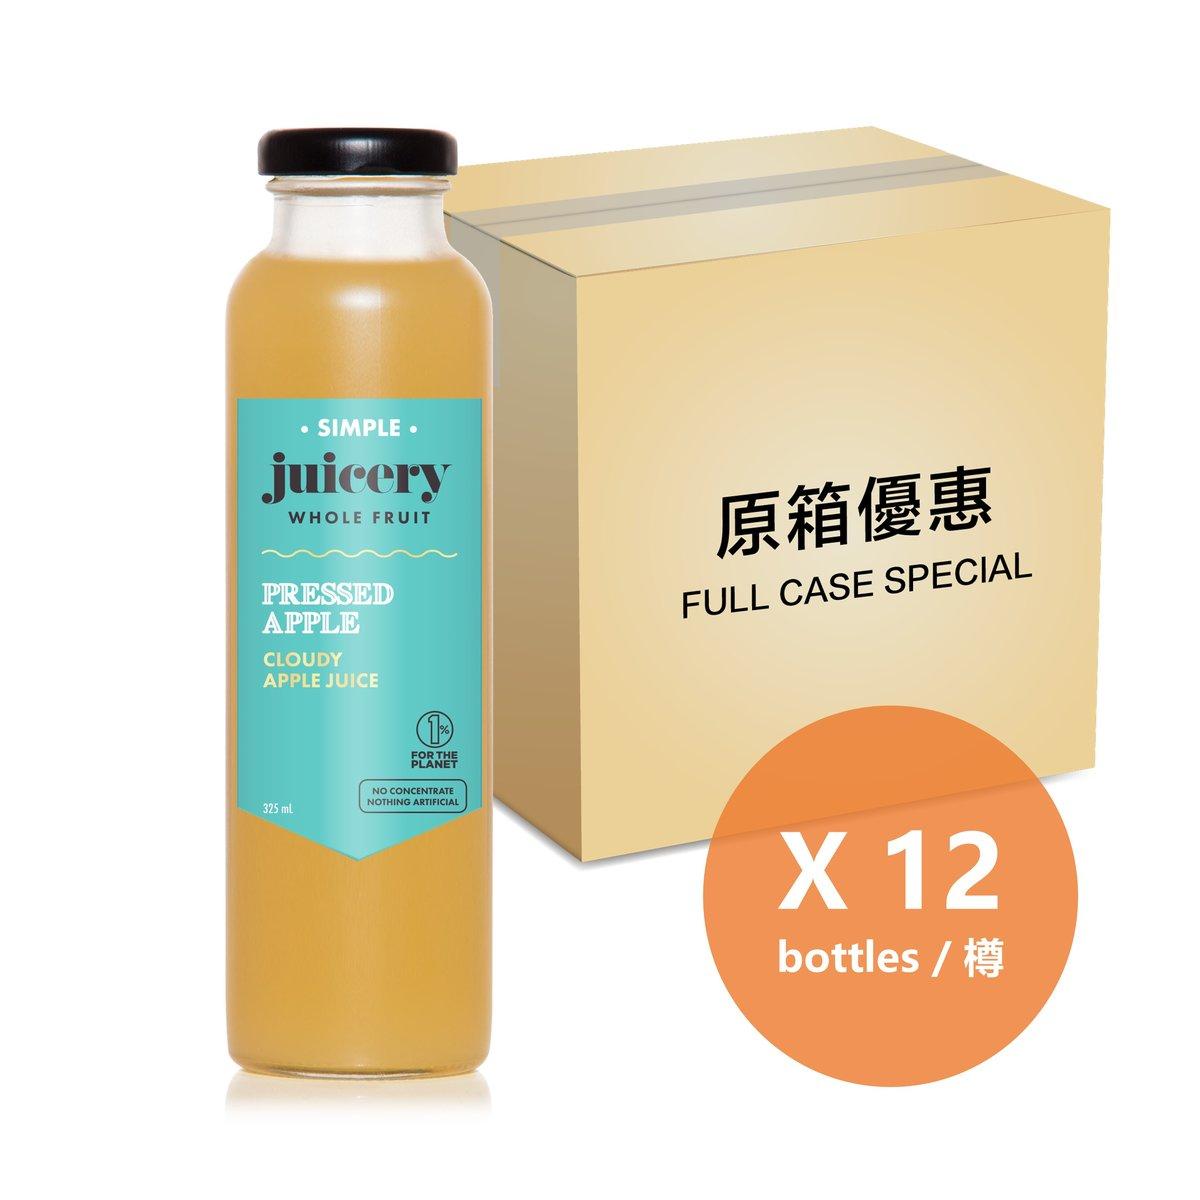 [Full Case] Pressed Apple Juice - 325ml Bottle